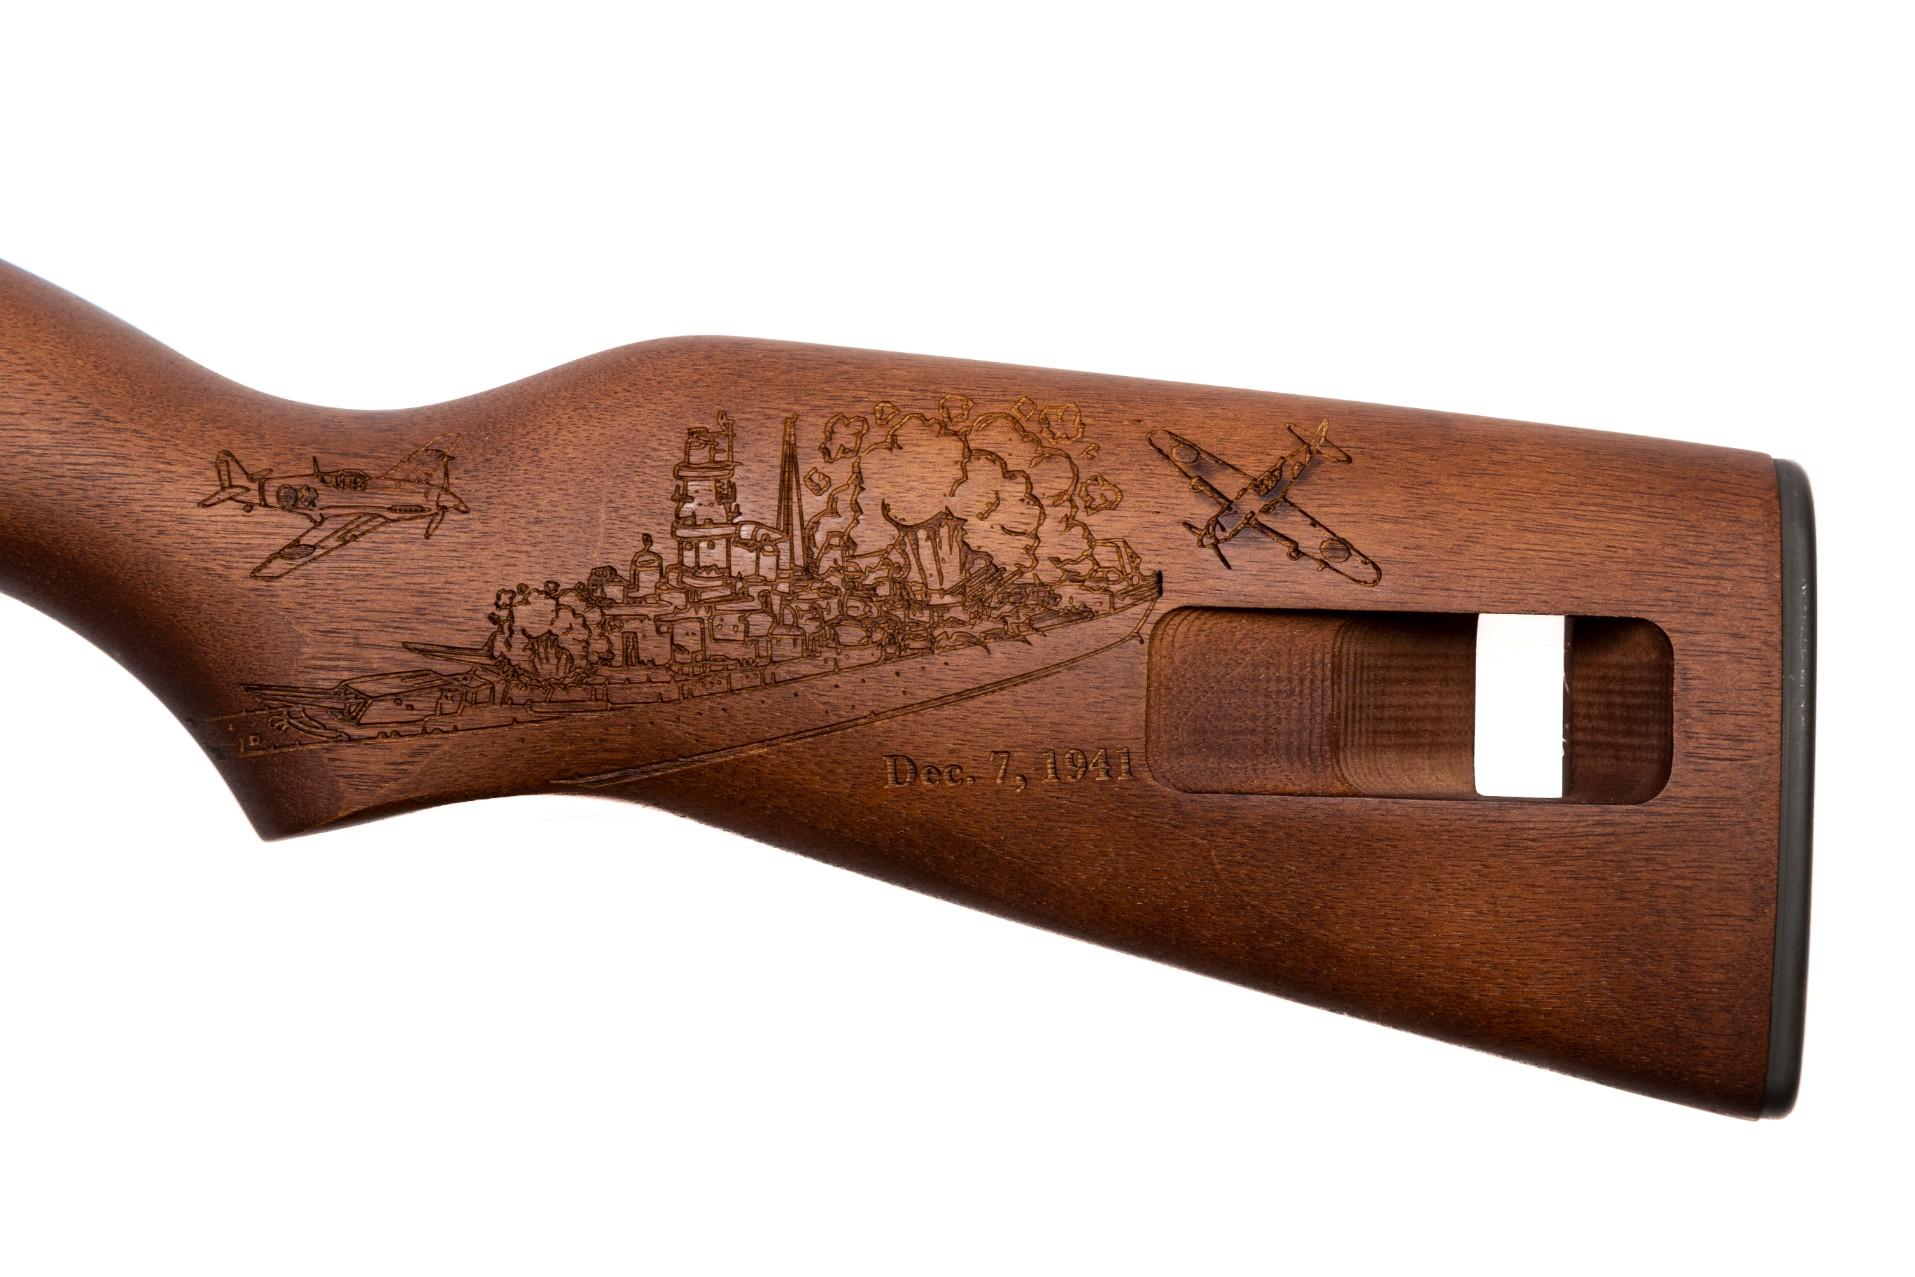 Vengeance WWII Custom M1 Carbine - Auto-Ordnance | Original